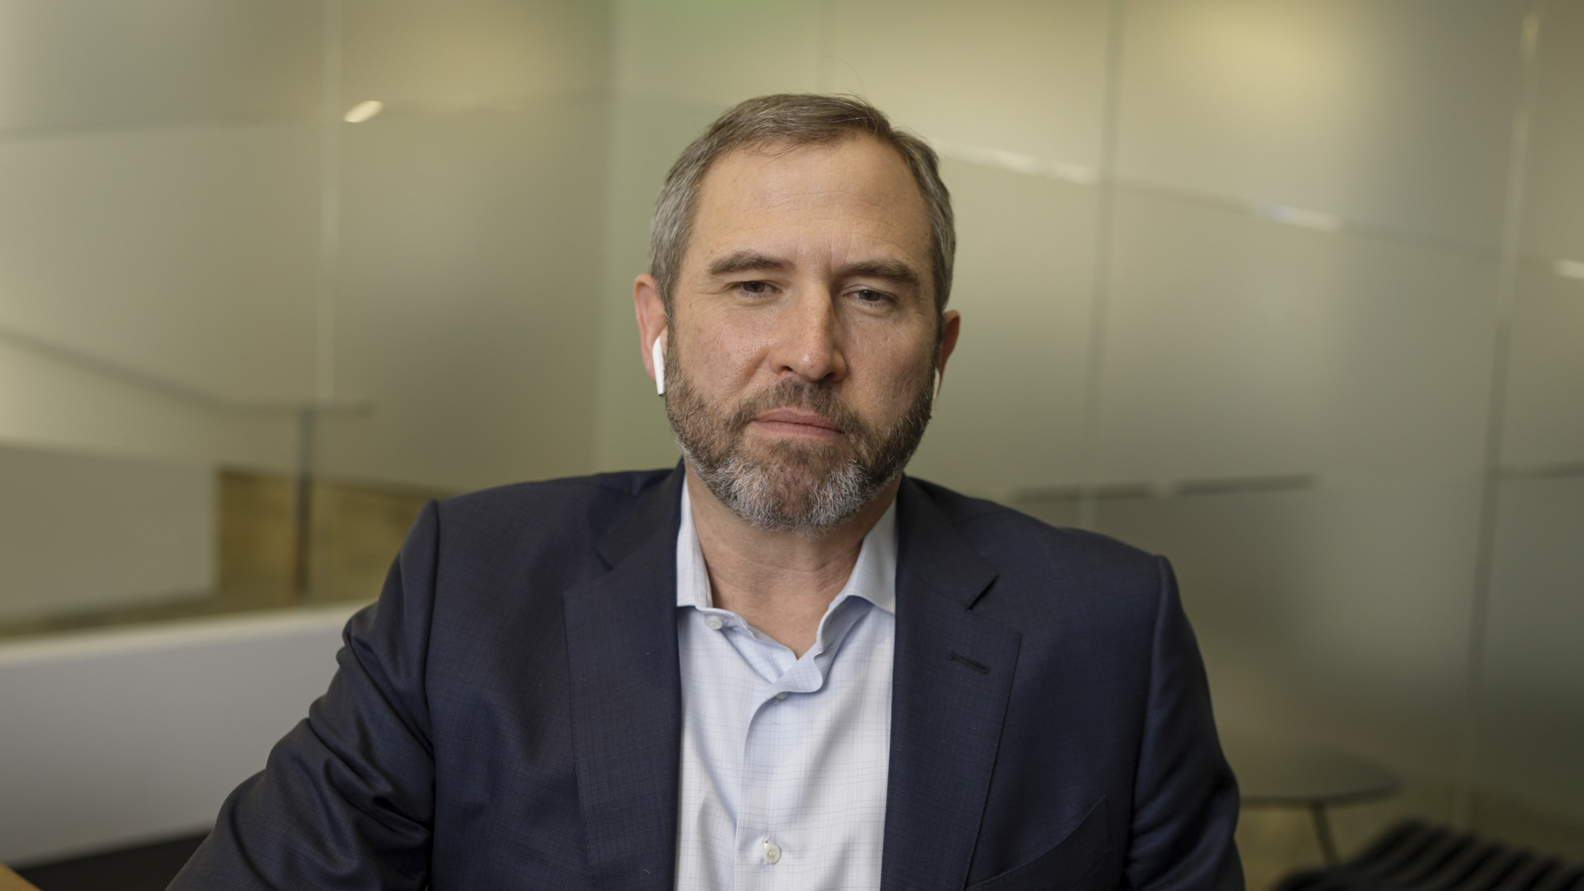 Brad Garlinghouse, CEO of Ripple